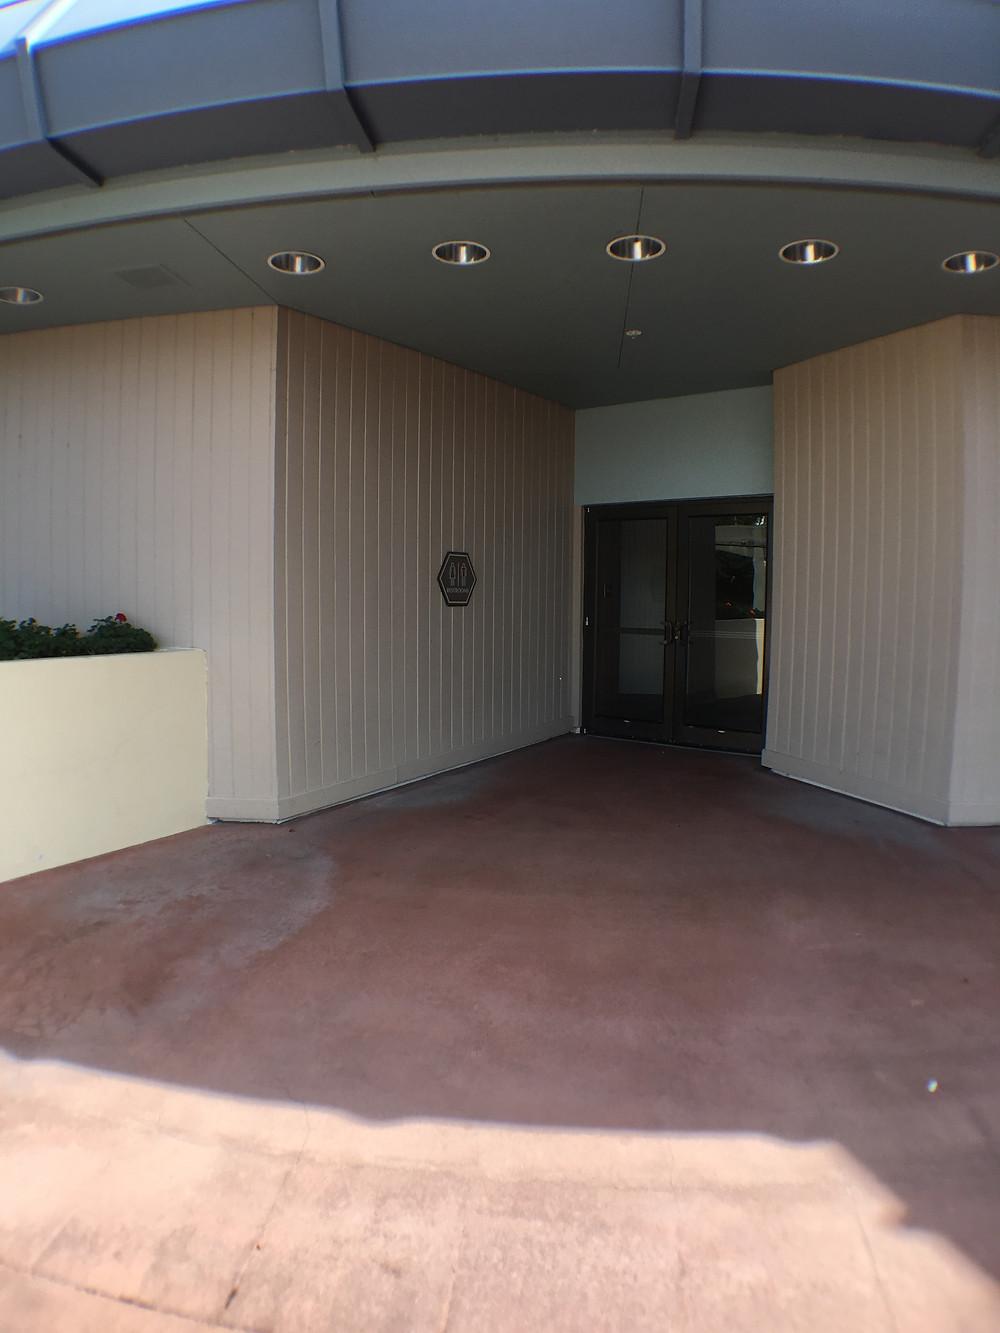 Entrance to Odyssey Center Epcot